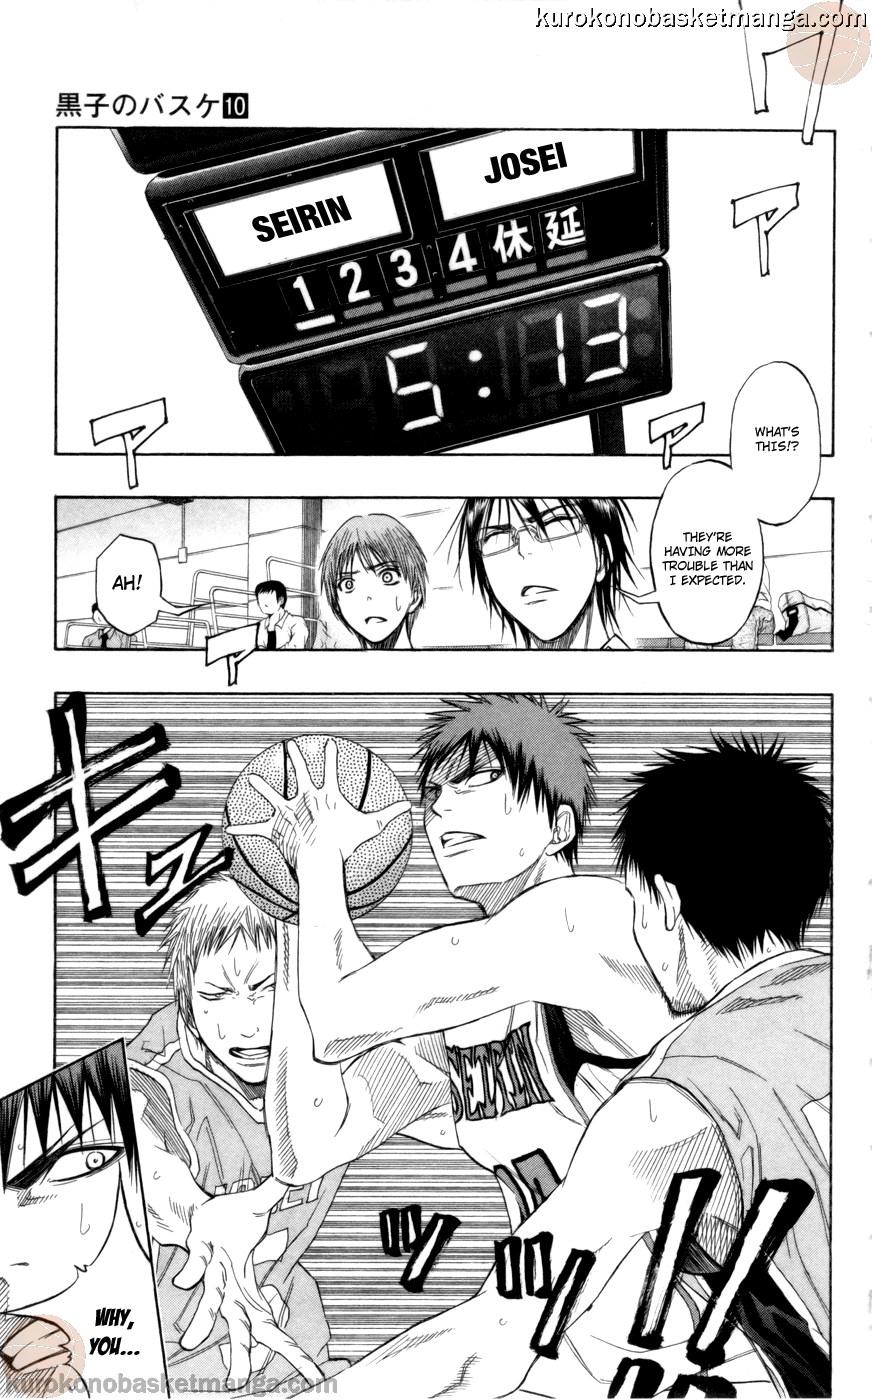 Kuroko no Basket Manga Chapter 82 - Image 05